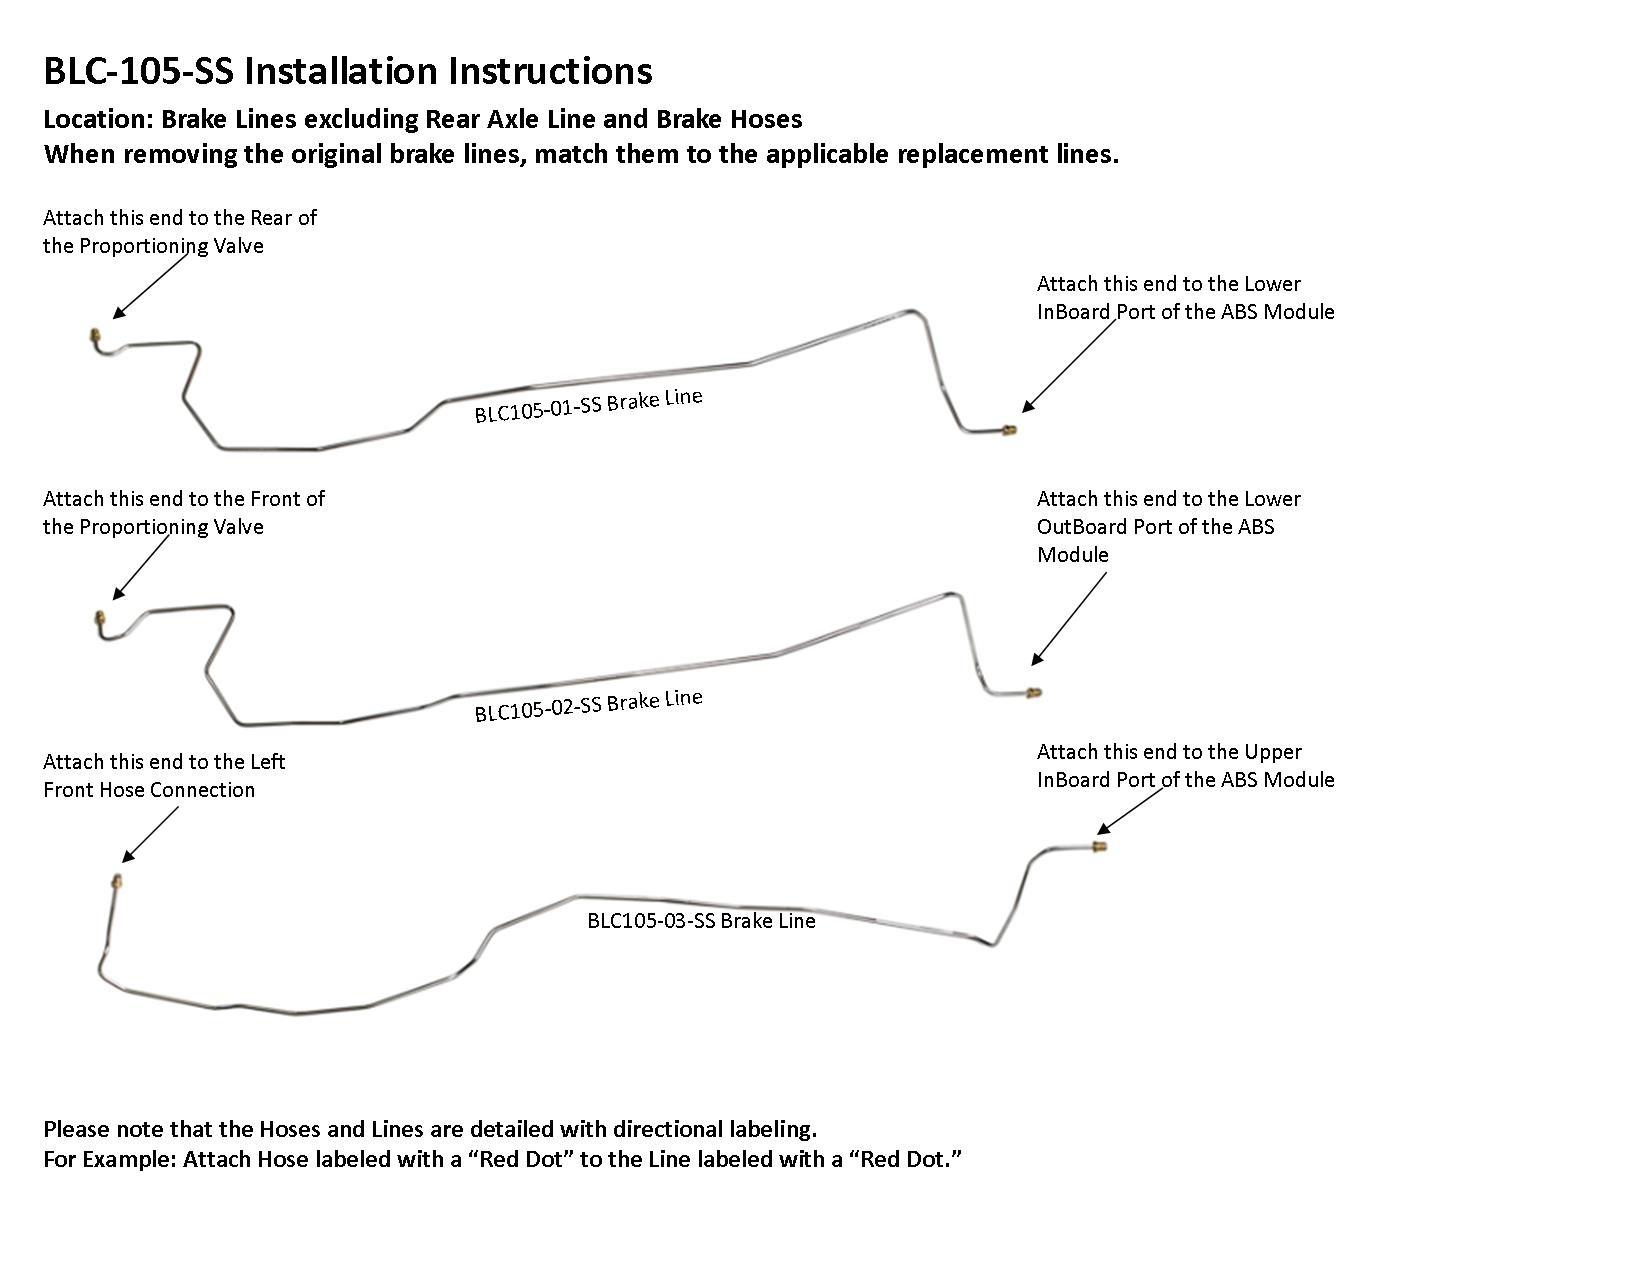 Wiring Diagram For Brake Proportioning Valve   Wiring Library